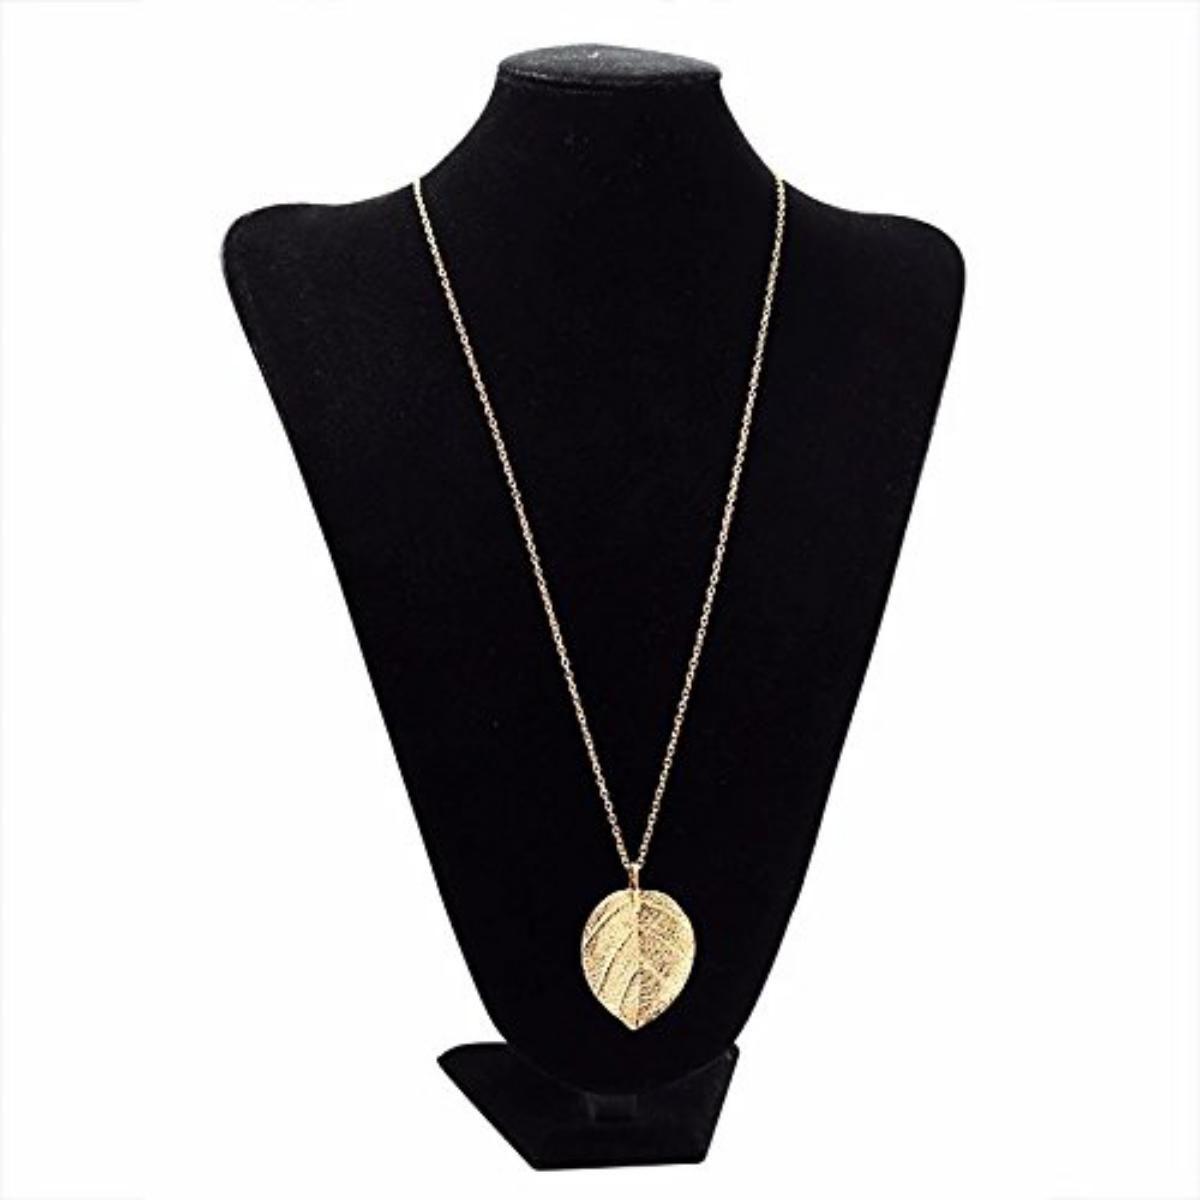 Trendy Leaf Design Gold Plated Long Chain Pendant For Women & Girls